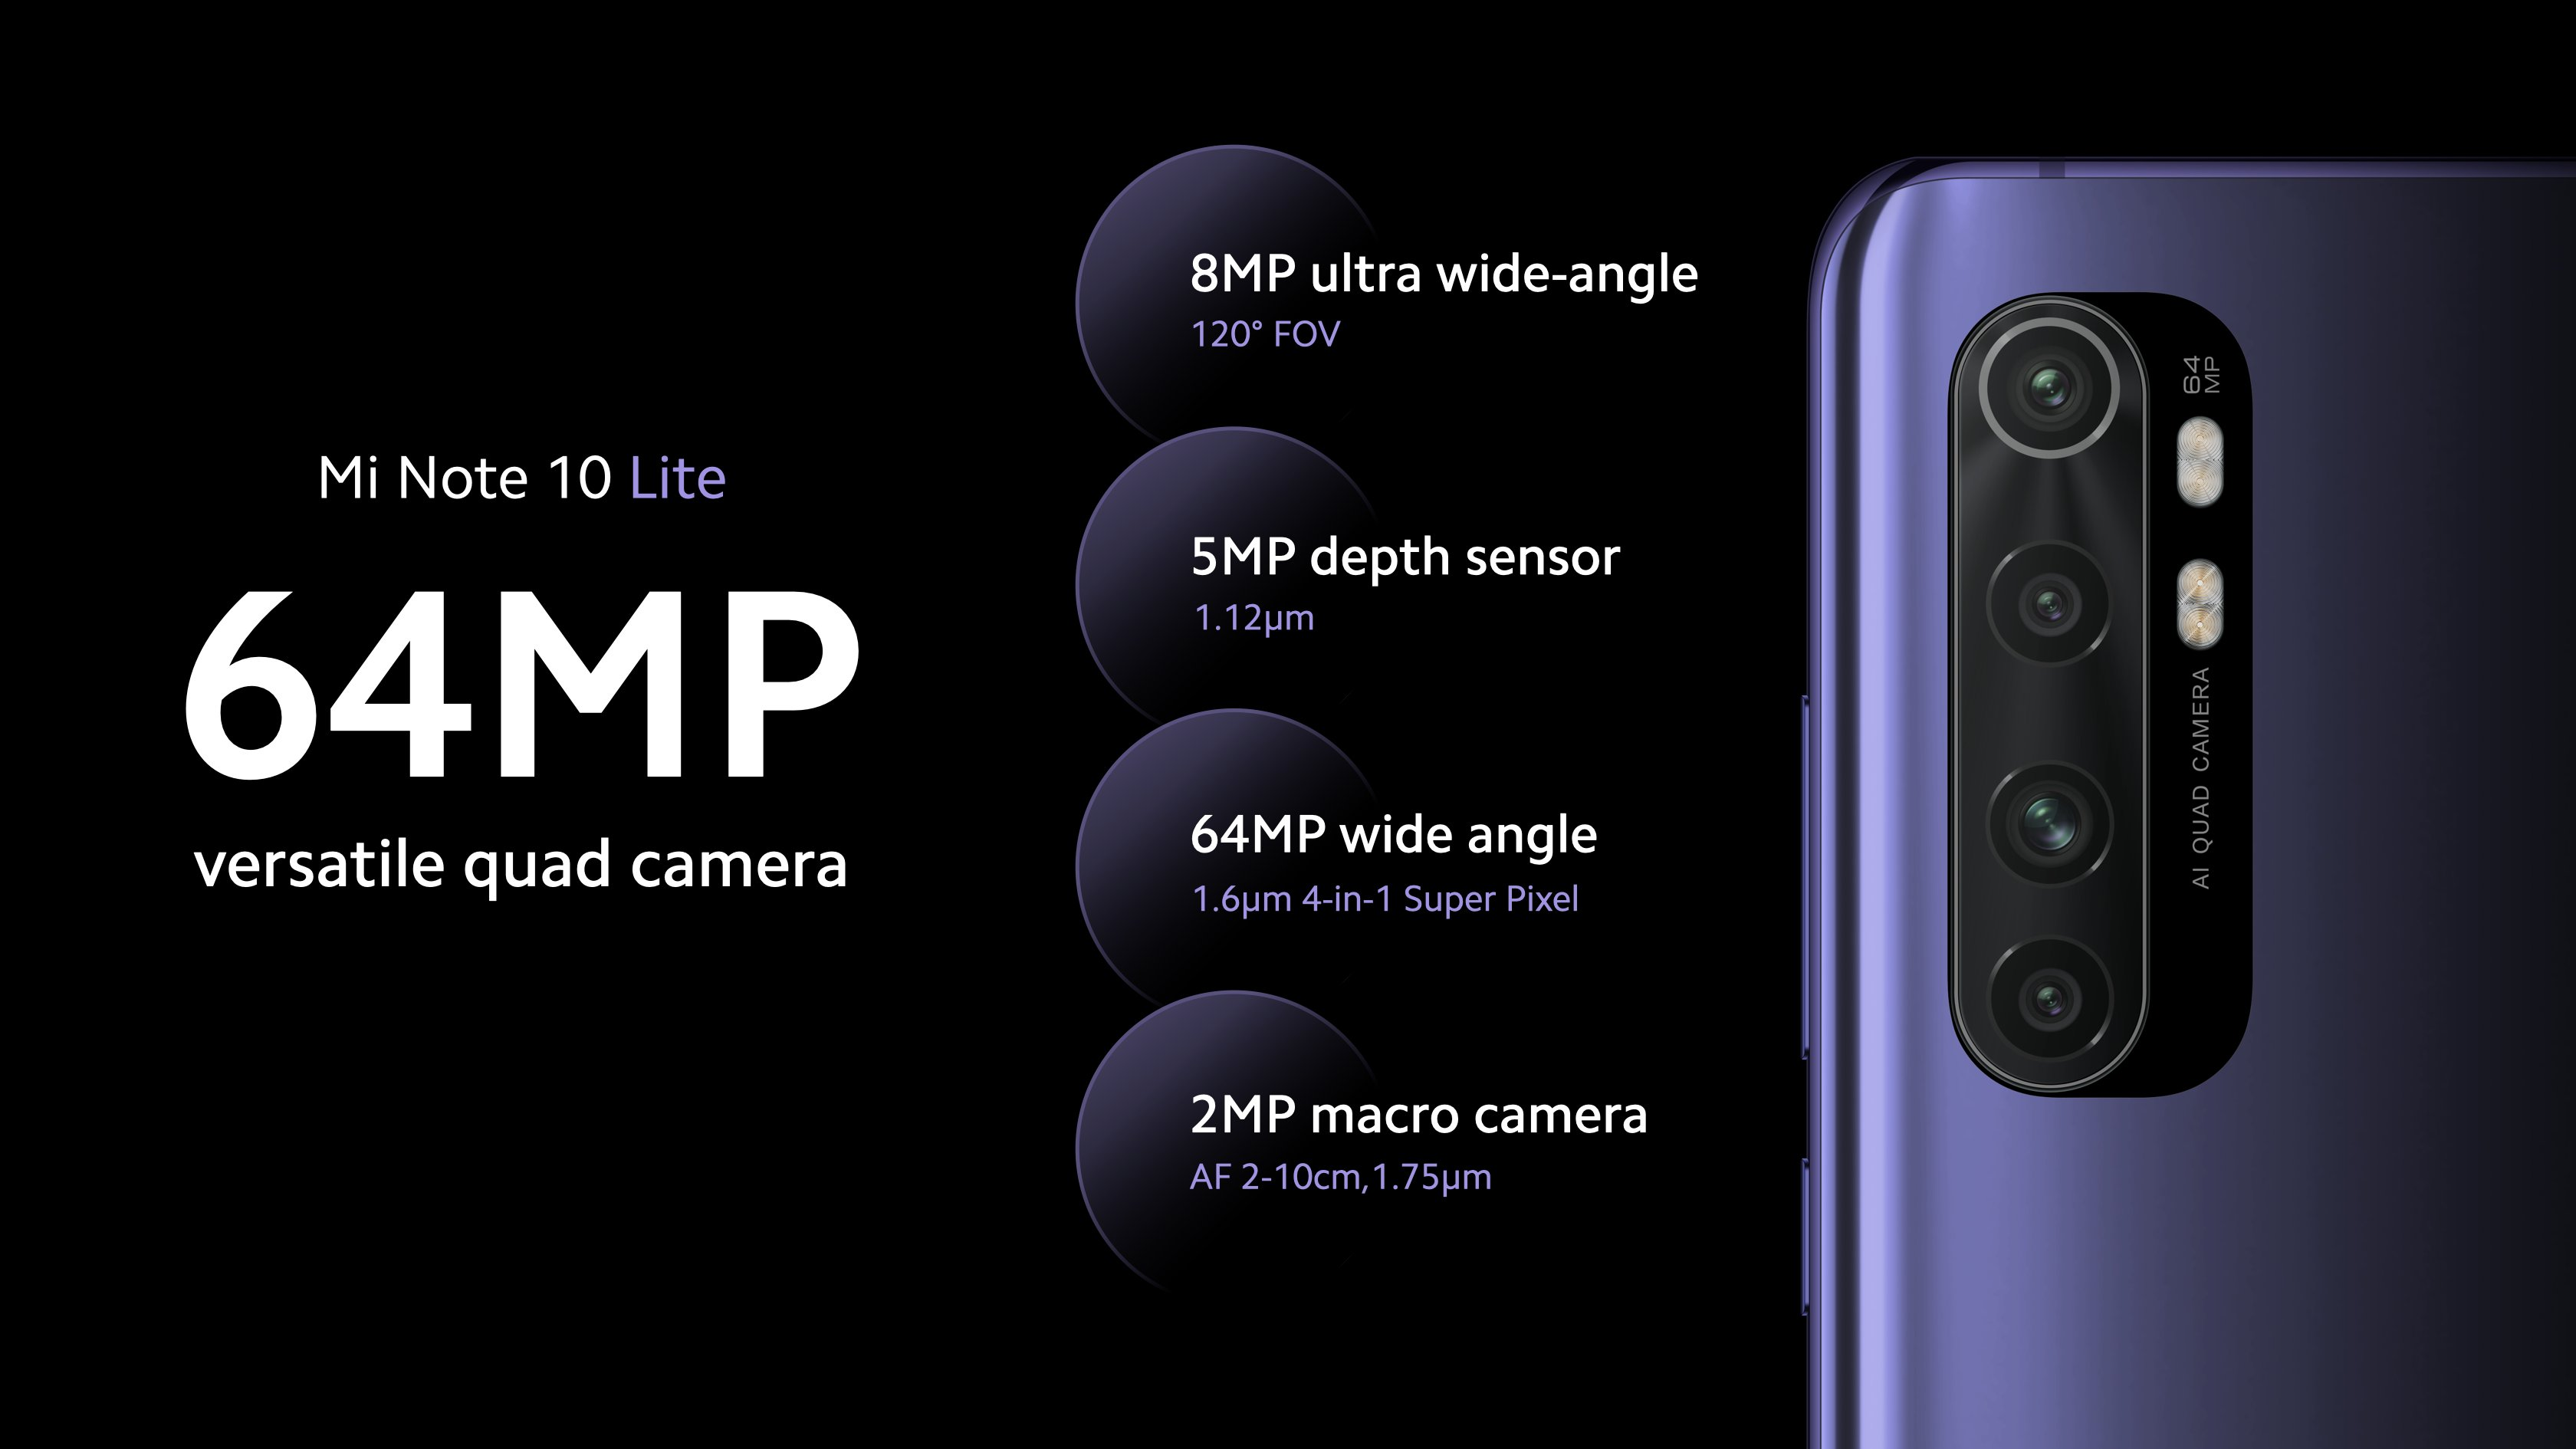 Camera Features of Mi Note 10 Lite